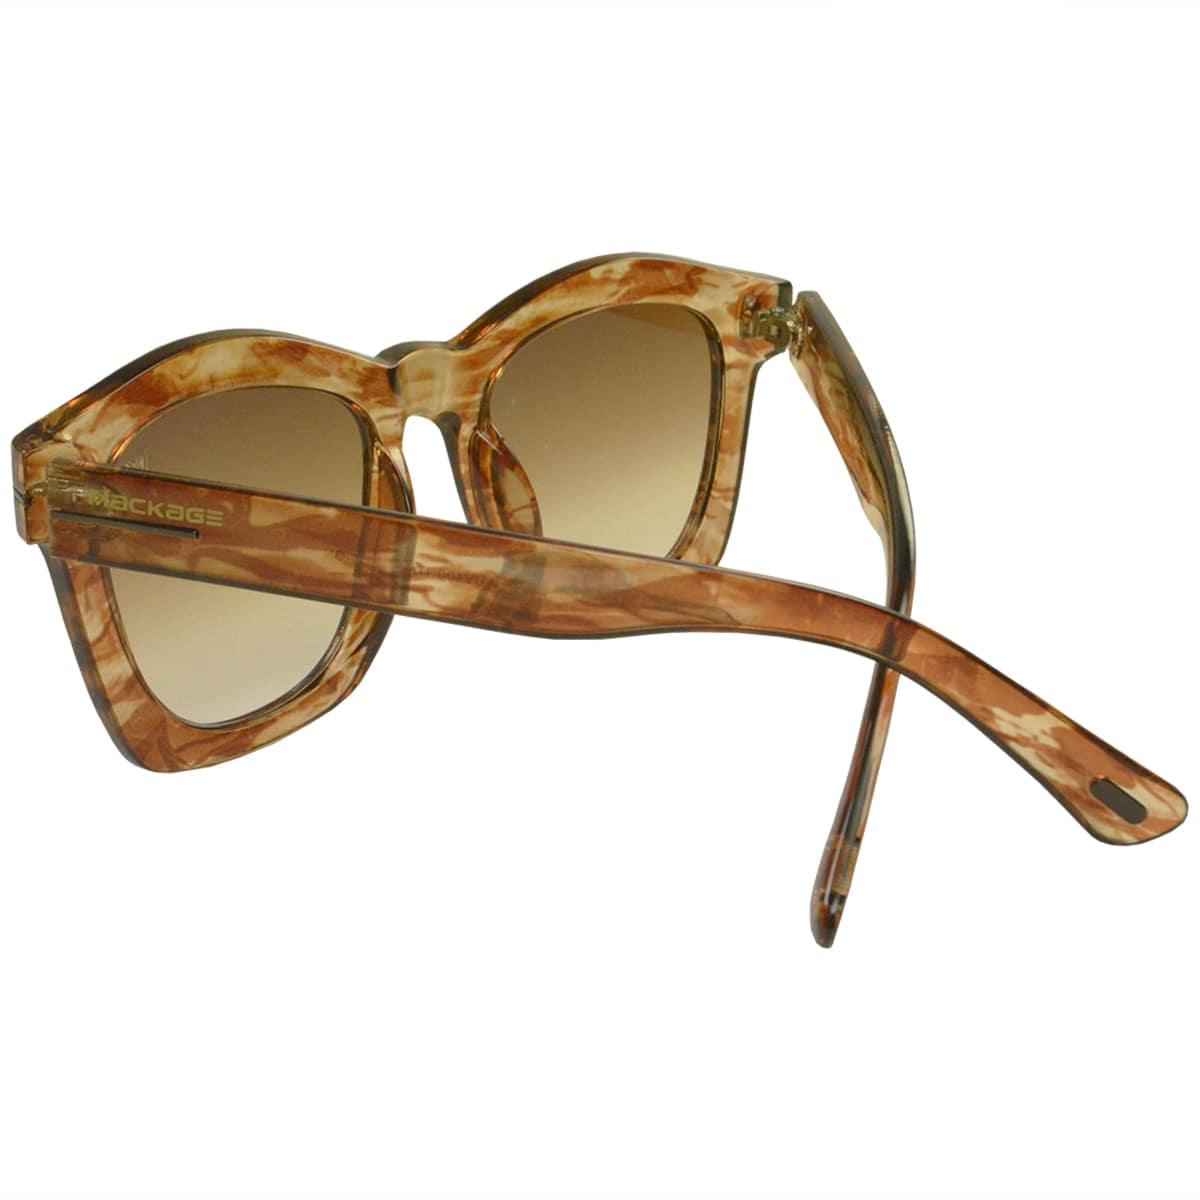 Óculos De Sol Mackage Feminino Acetato Oversize Quadrado